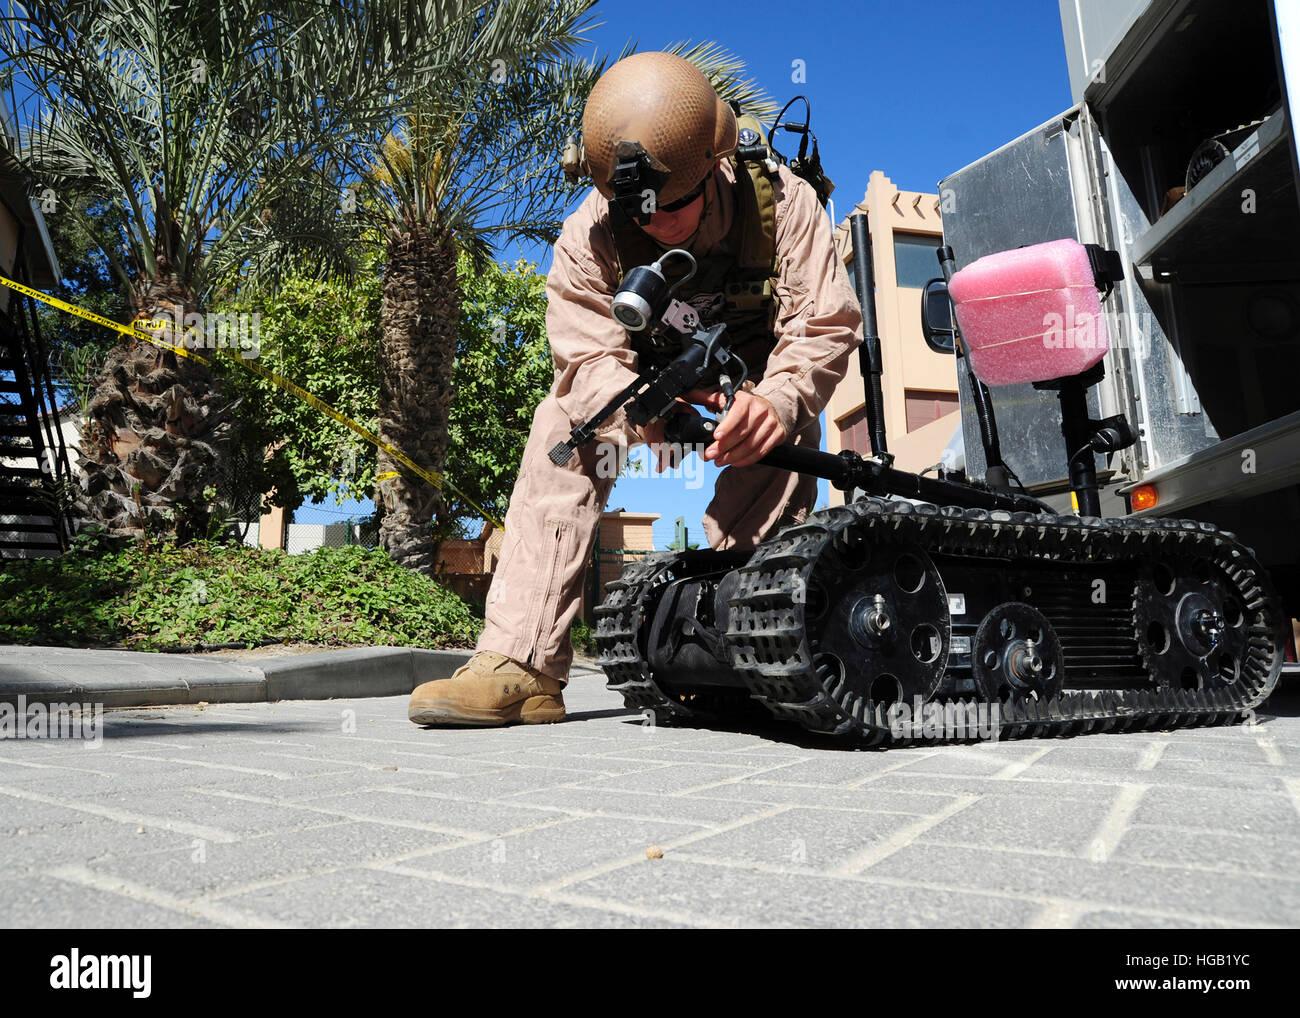 Explosive Ordnance Disposal Technician prepares a Talon remote-controlled robot. - Stock Image